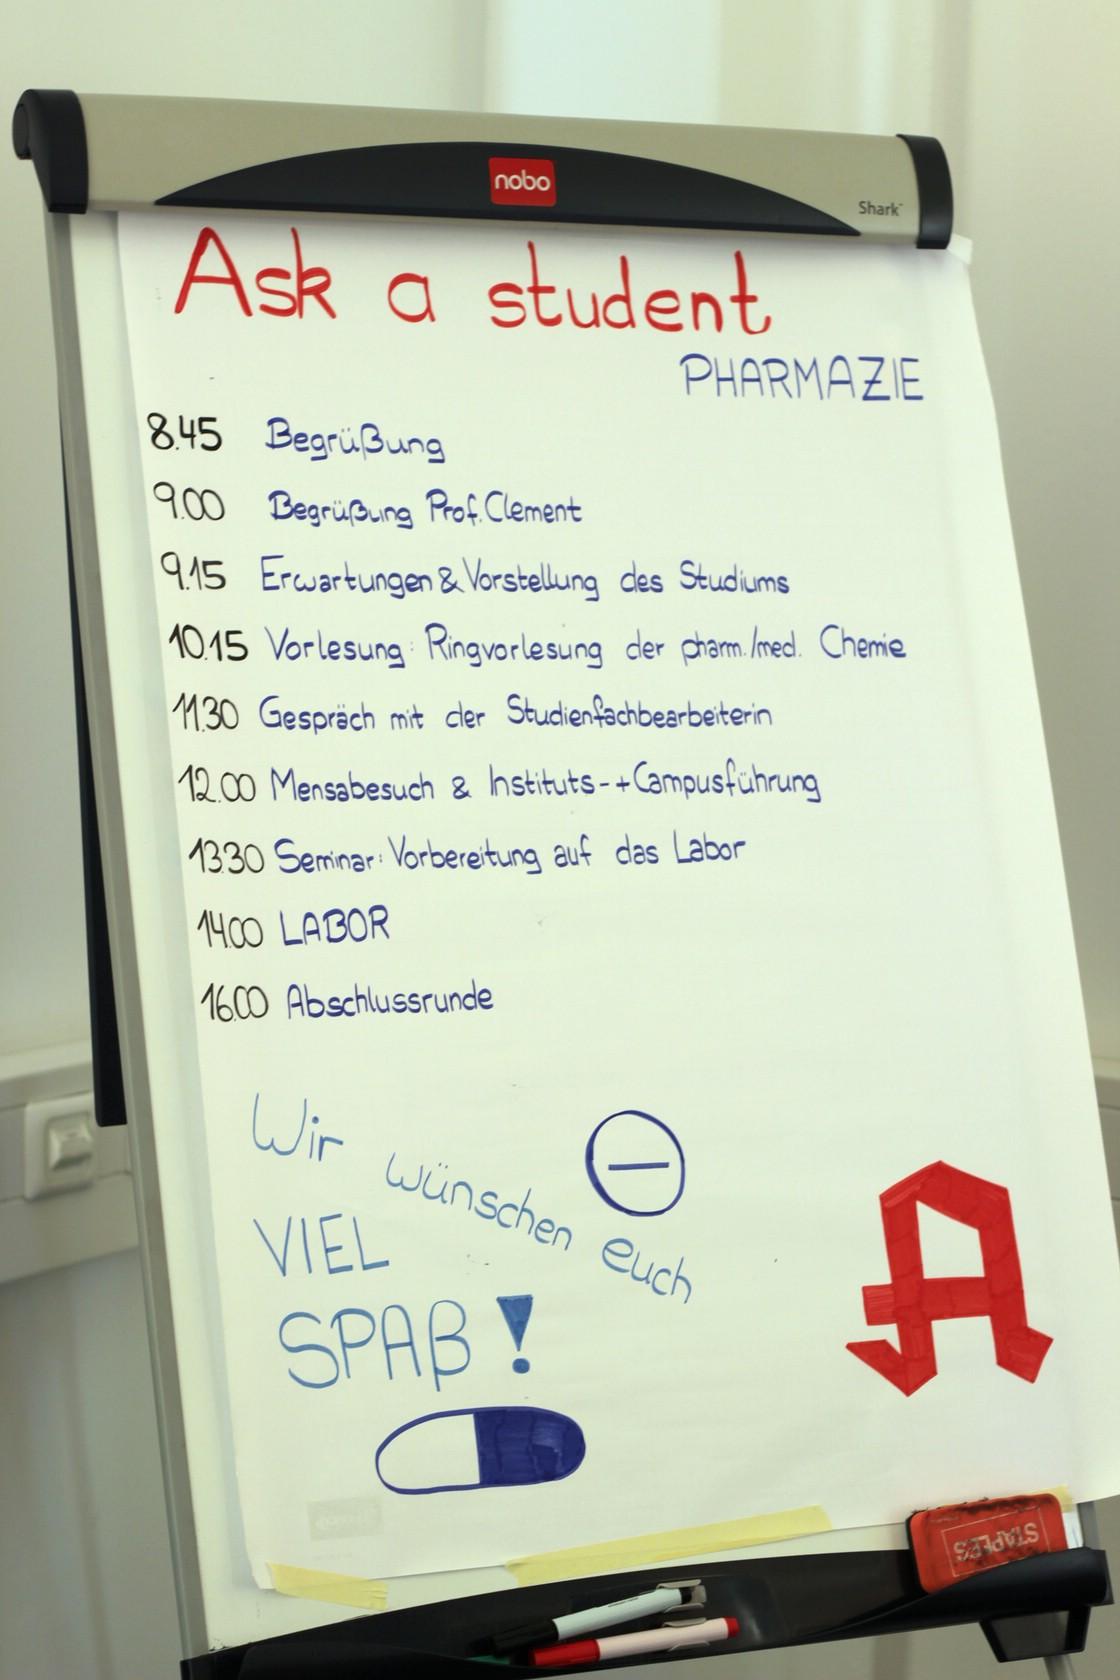 Ask a student - Pharmazie Ablauf 1/1 (Foto: Ramona Dabringer)